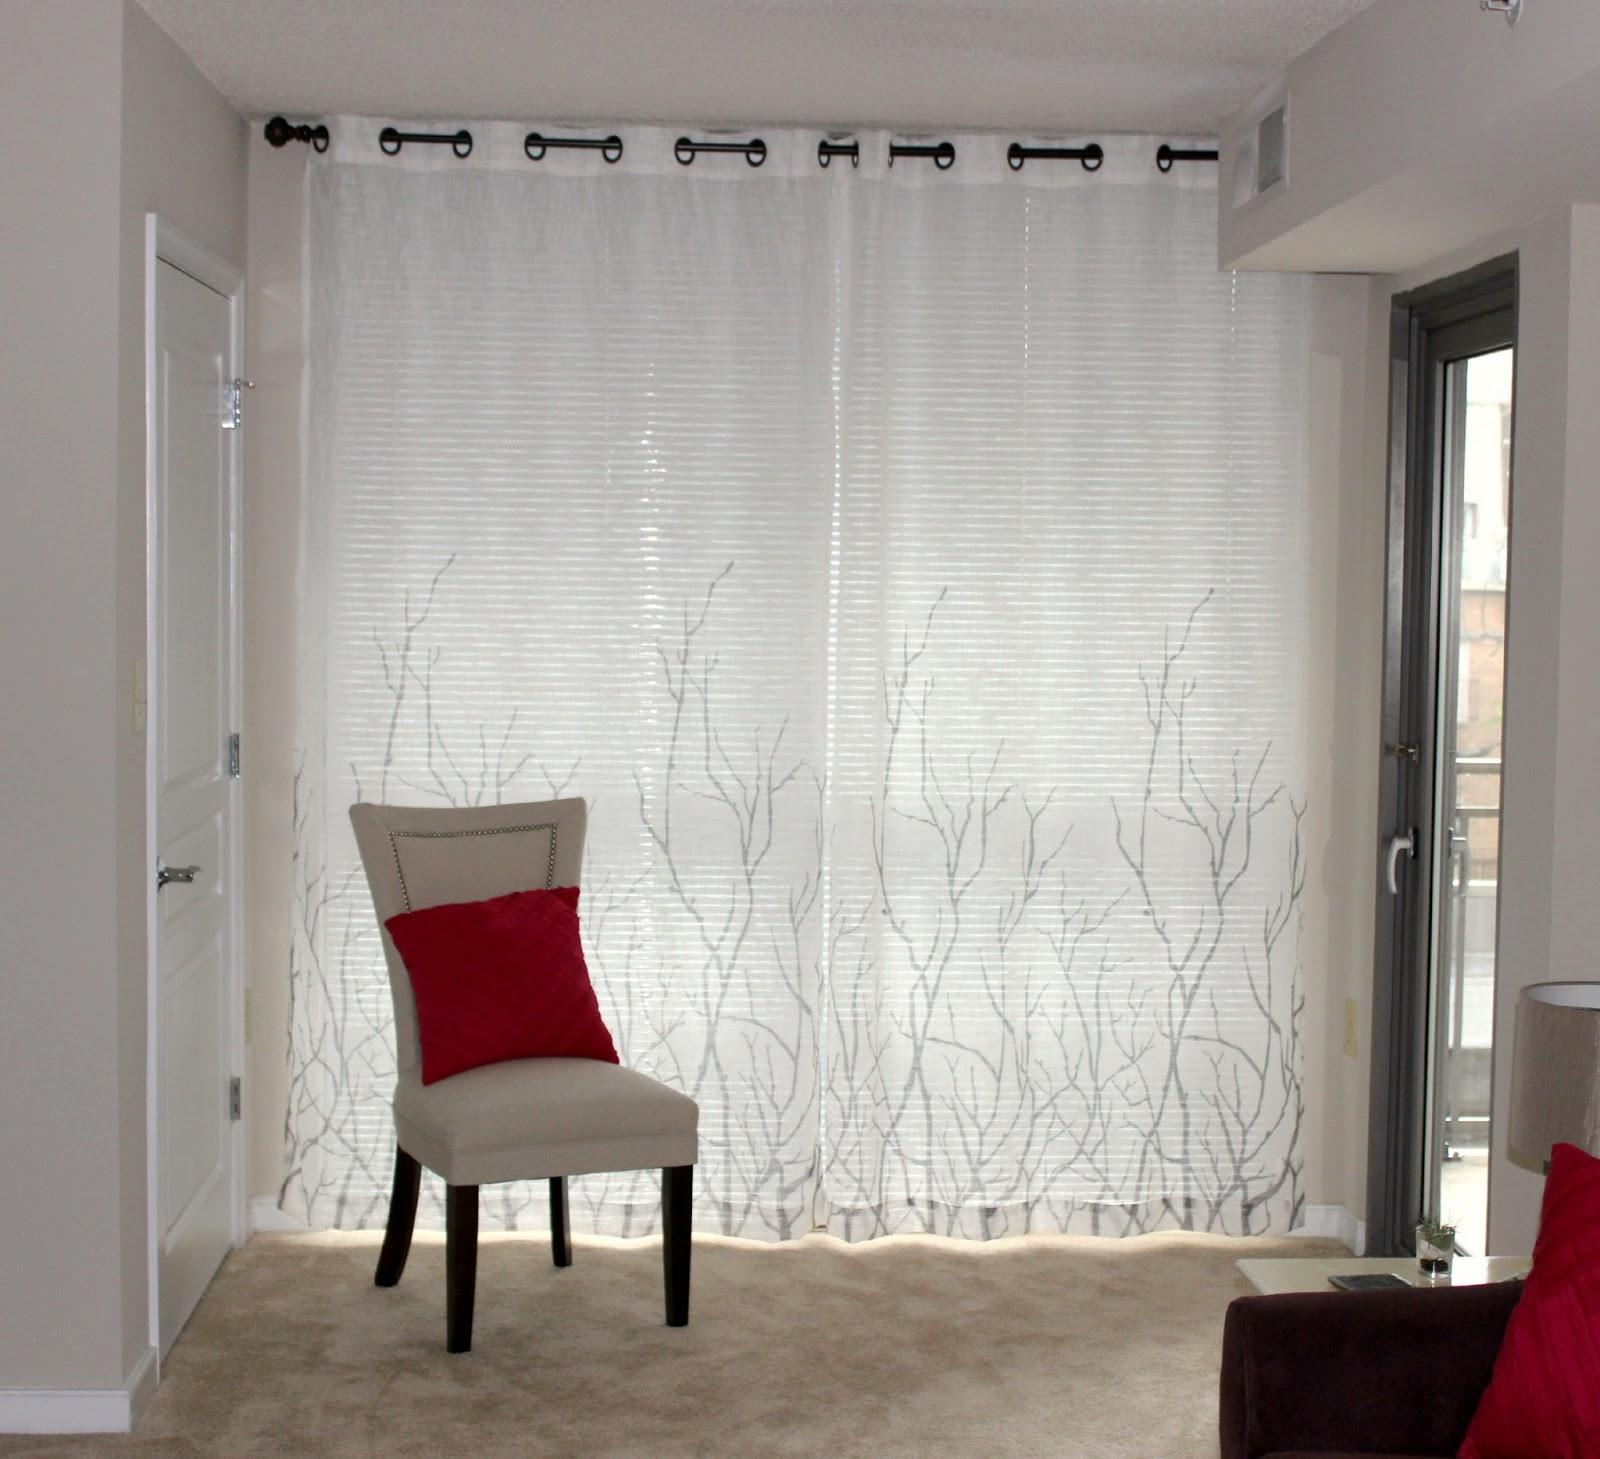 Dianna's DIY Curtain Ties